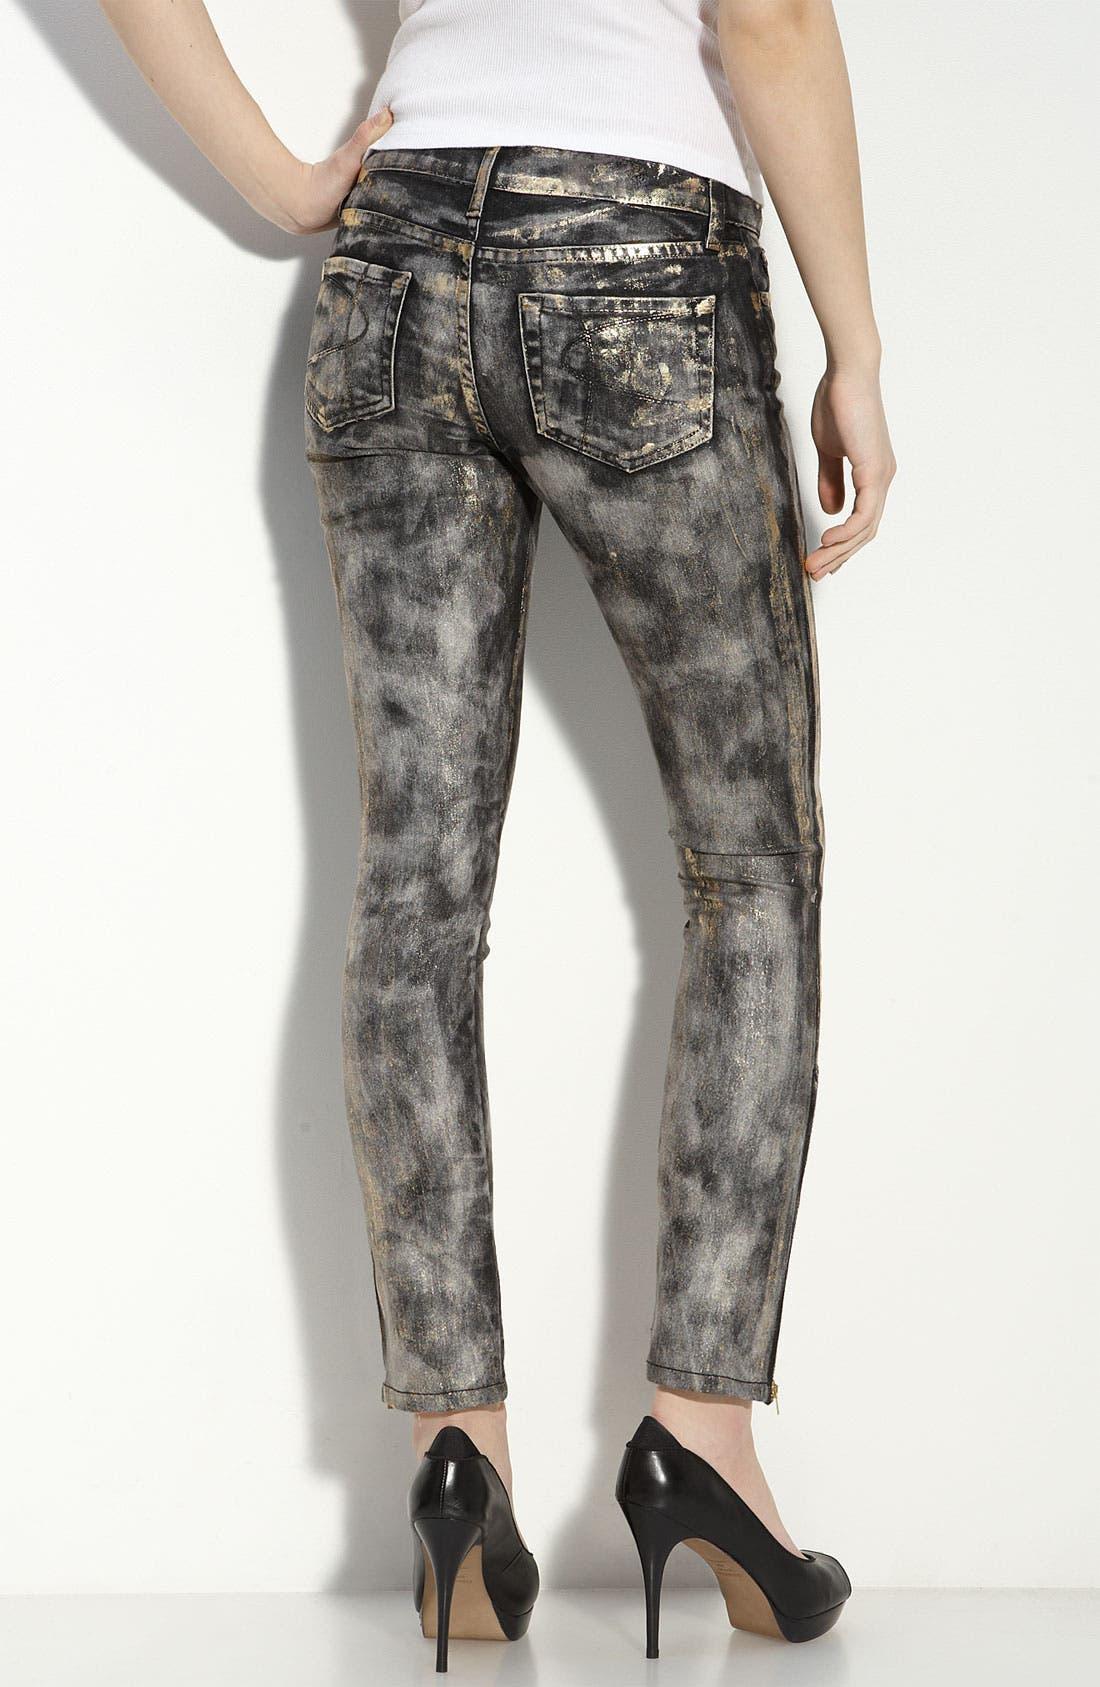 Alternate Image 1 Selected - David Kahn Jeans 'Nikki' Ankle Jeans